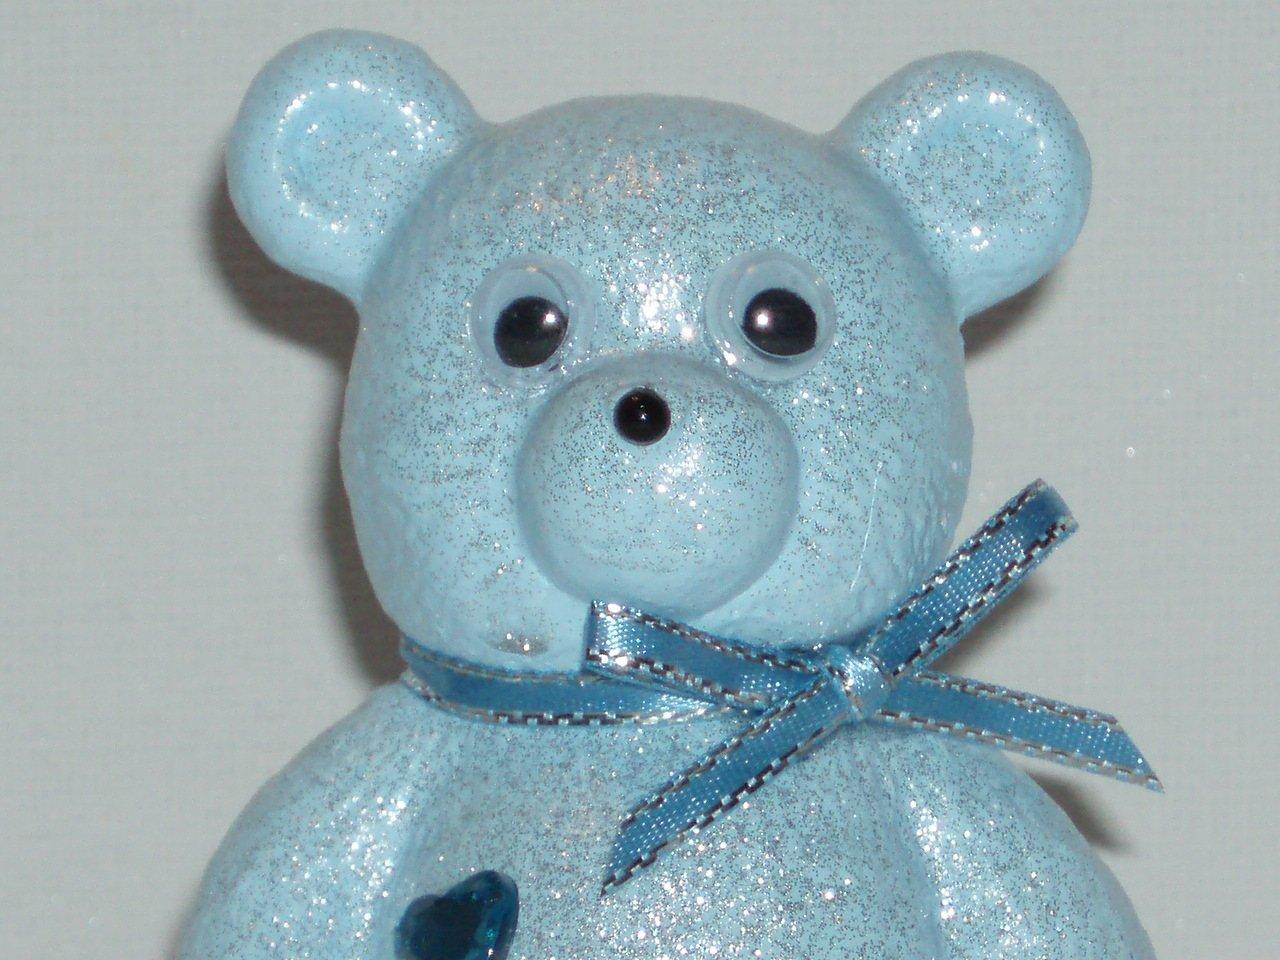 Grandad Cute Baby Blue Teddy Bear Outdoor Cemetery Grave Memorial Ornament